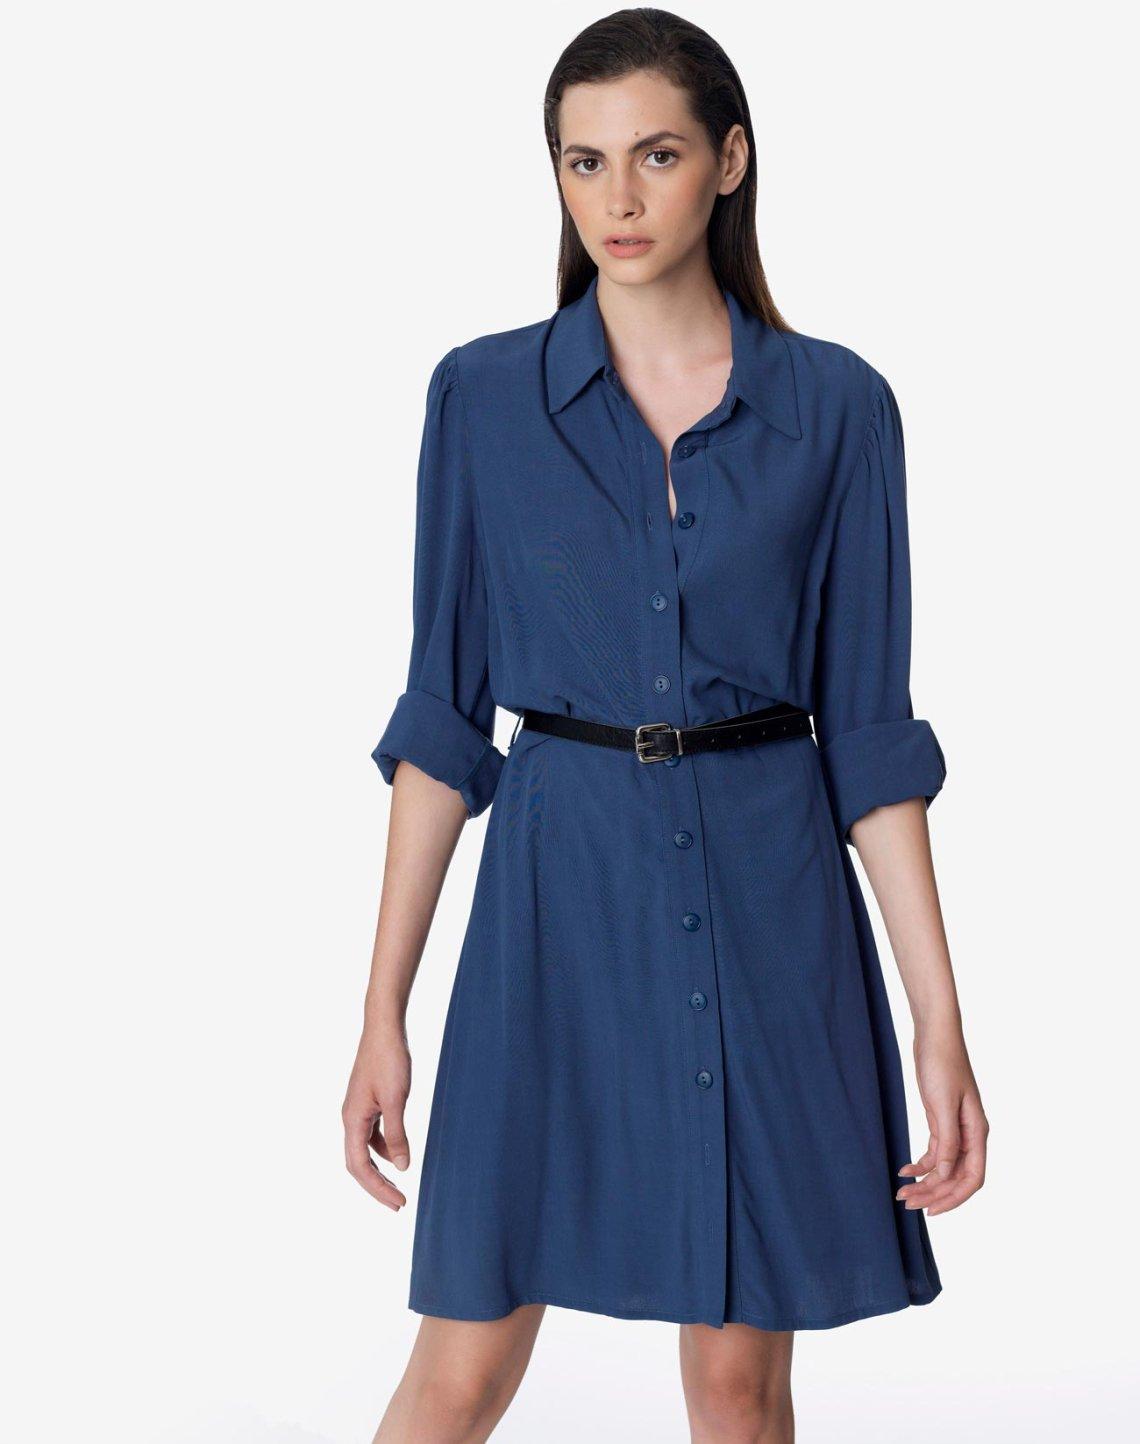 Mini shirt dress